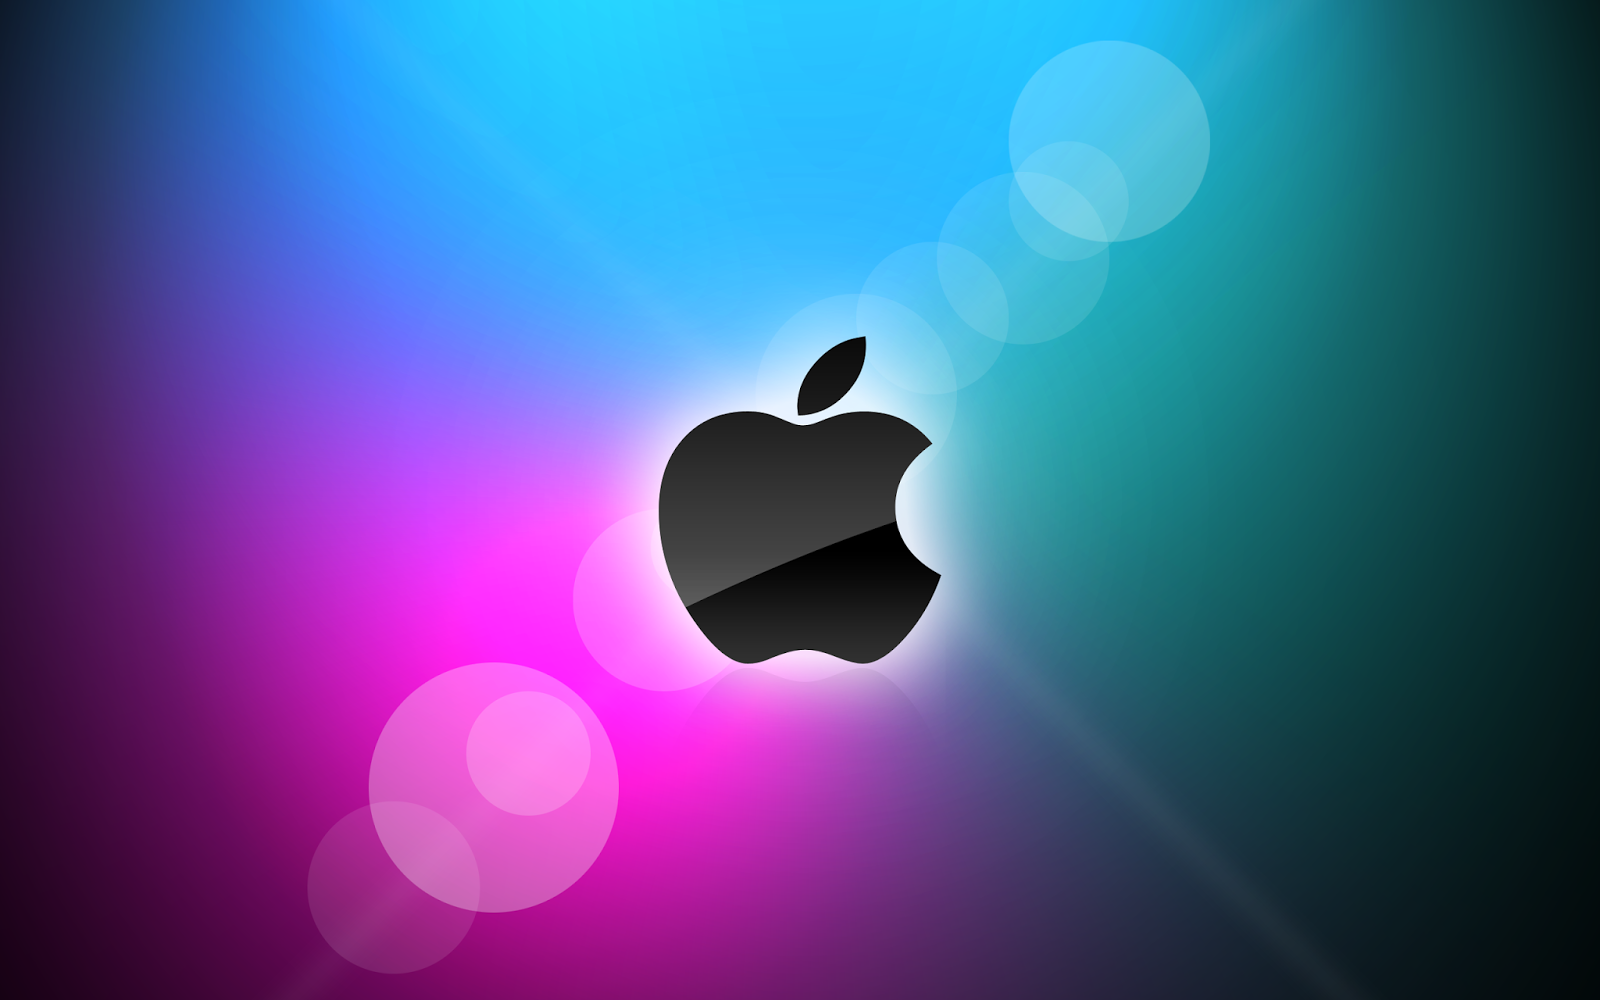 HD Wallpapers Desktop: Apple Mac HD Wallpapers